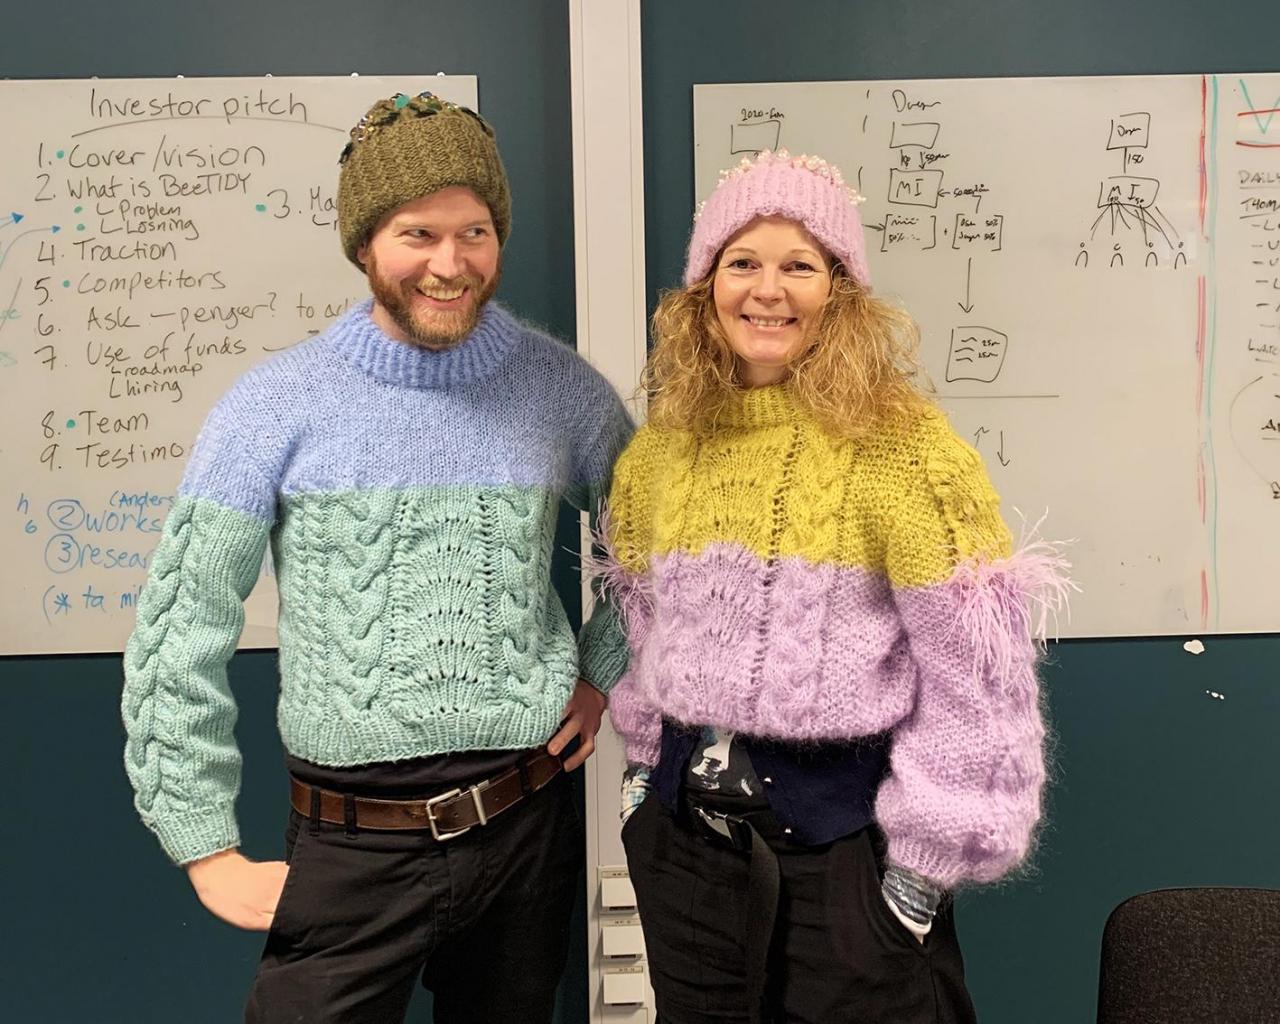 GRÜNDERE: Lars Barlindhaug og Cathrine Løland er to av de fire som står bak strikkeplattformen Woolit. Her er de kledd i gensere strikket for den norske designeren Malin Molden. Foto: Malin Molden